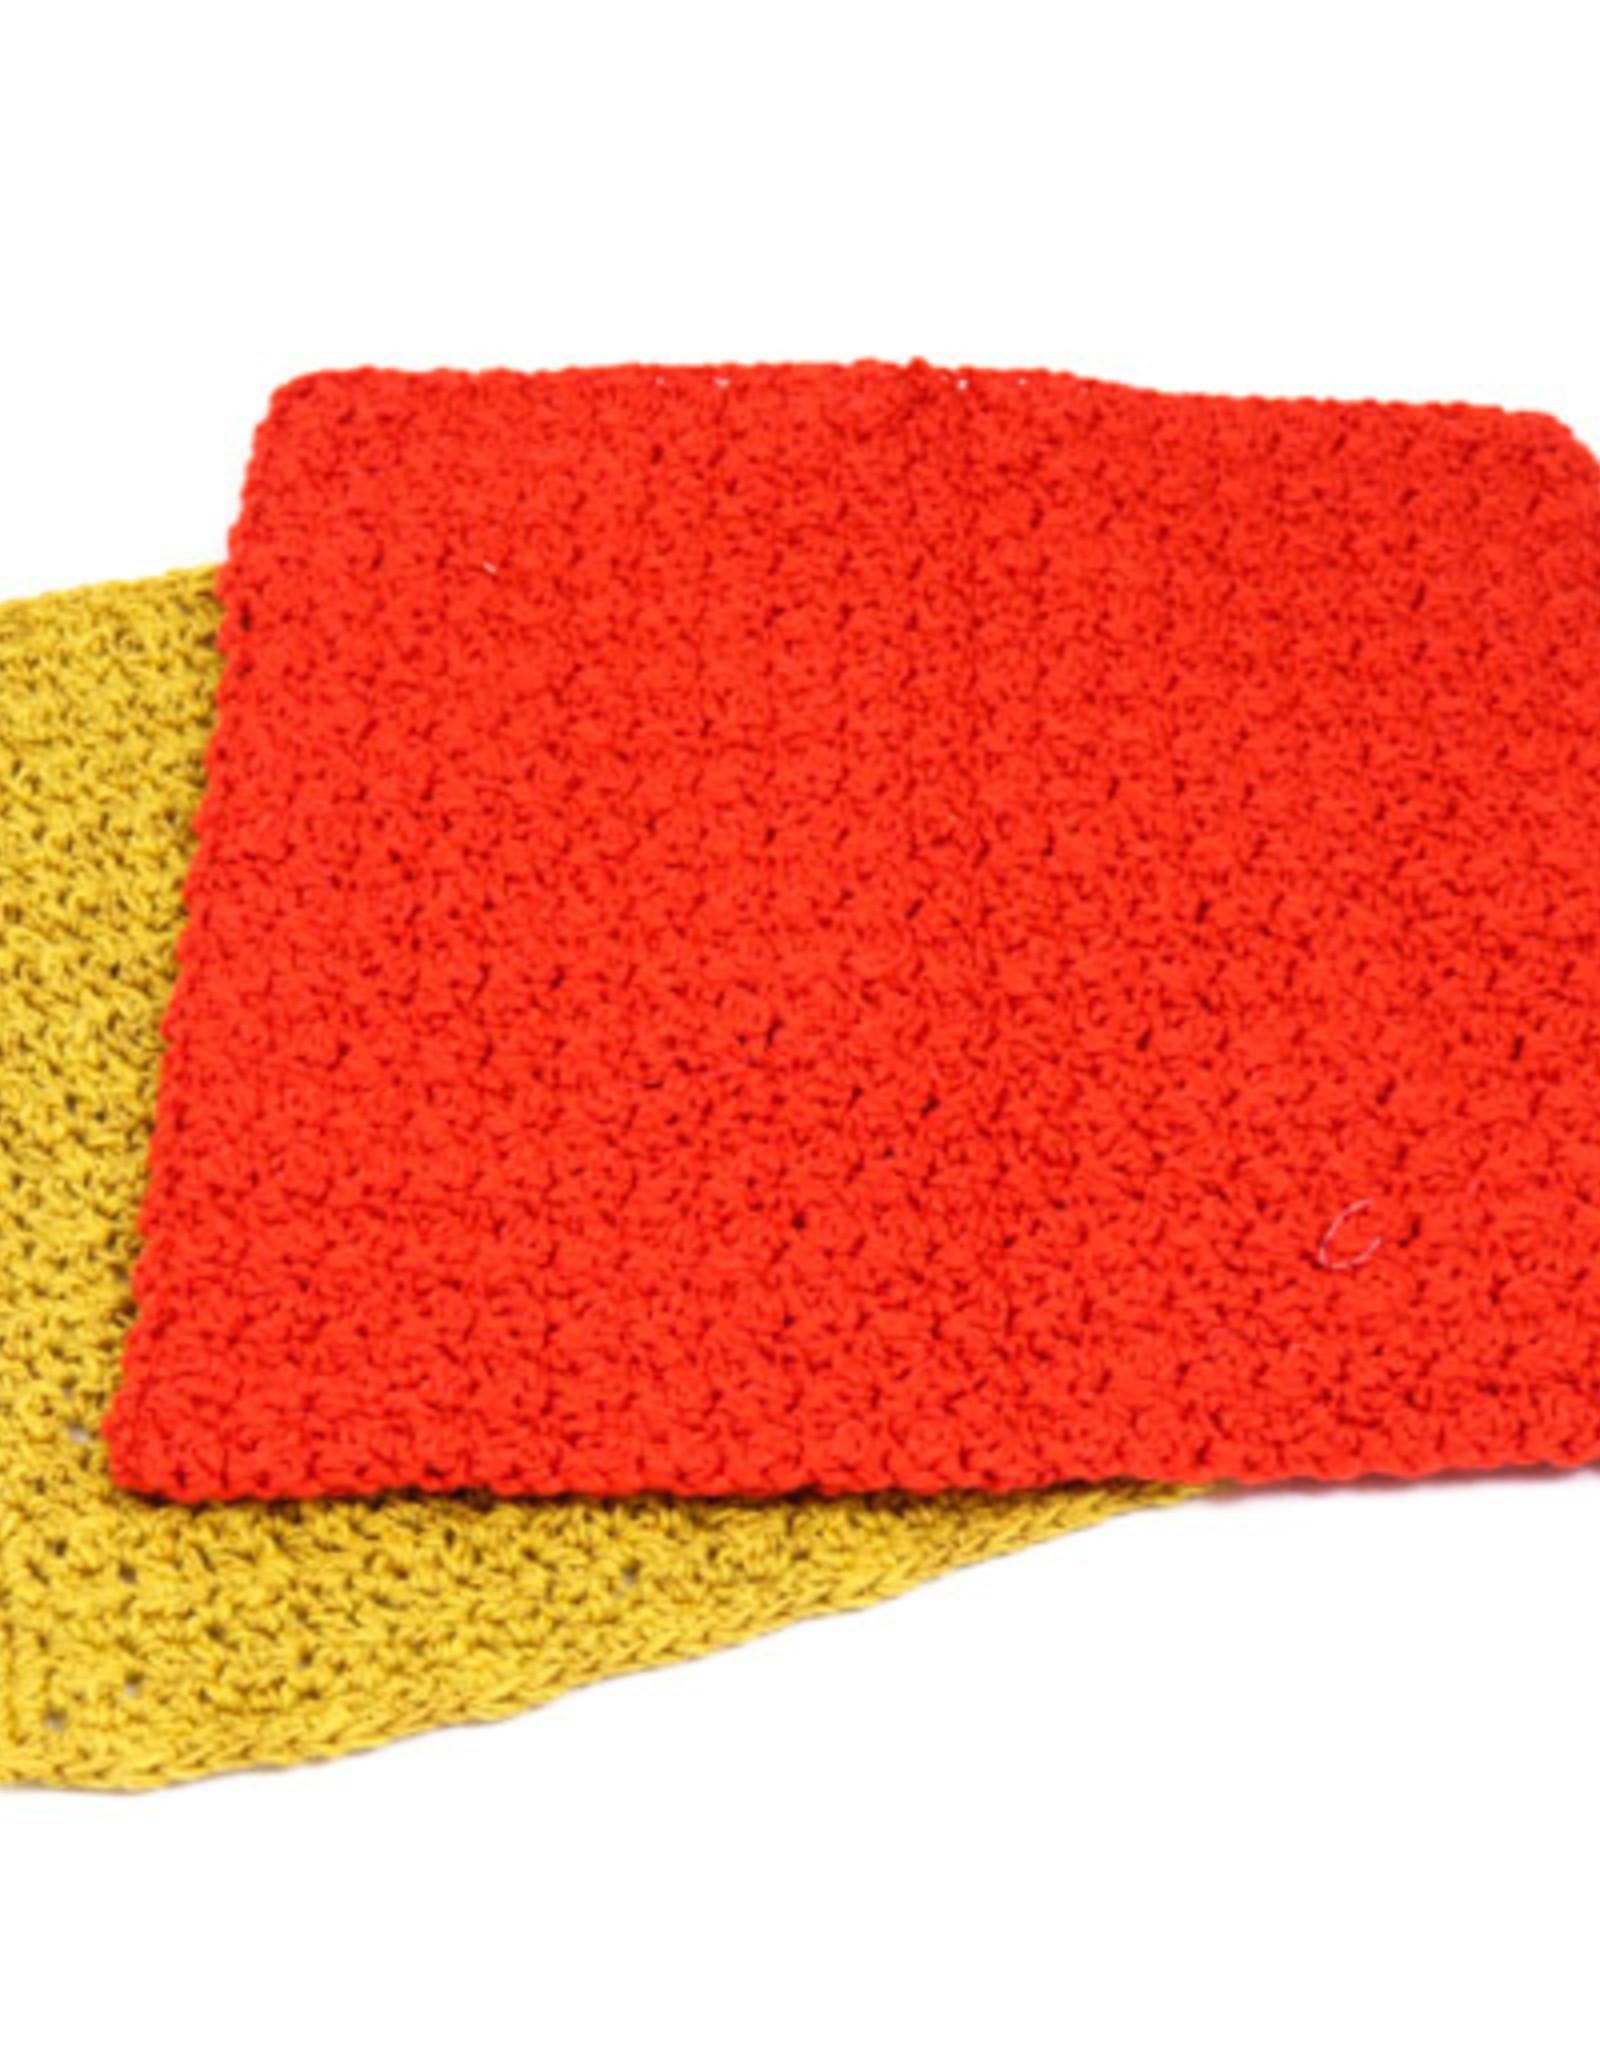 Crochet Dishcloth Class